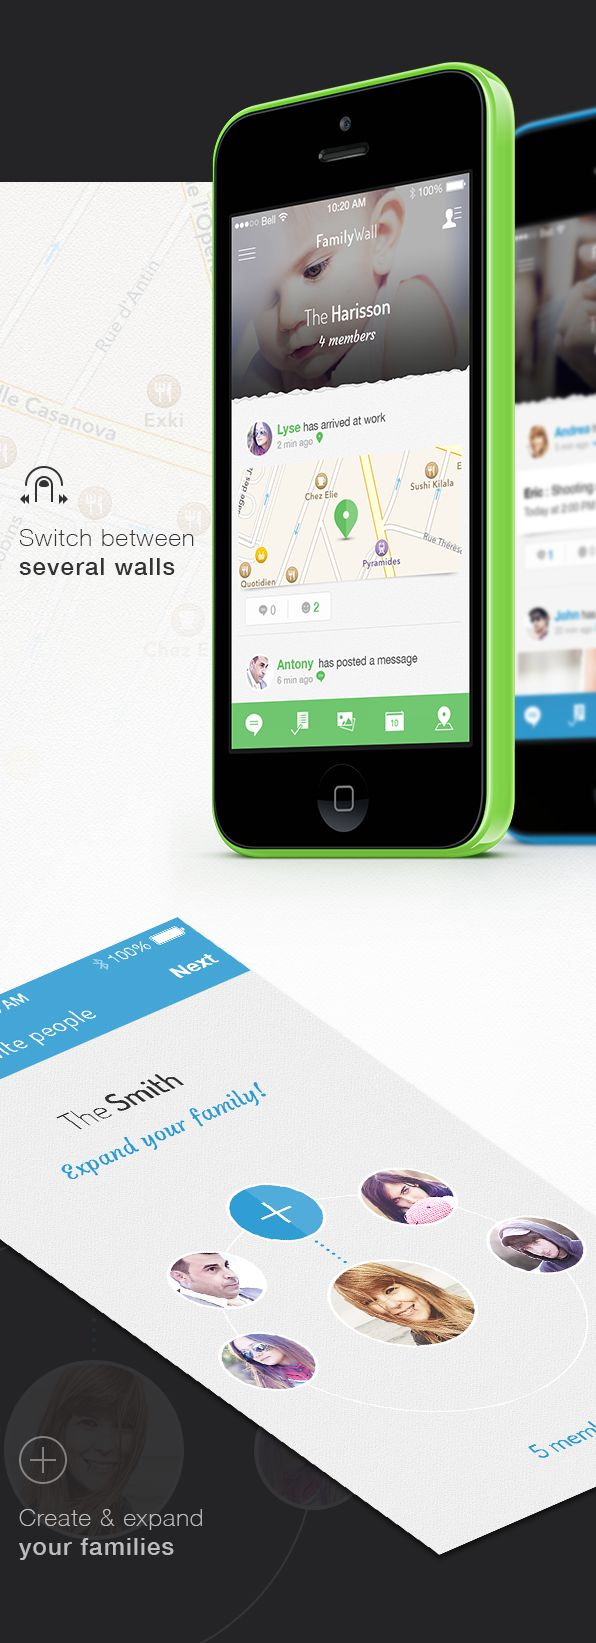 Family Wall App by Angelique Calmon, via Behance